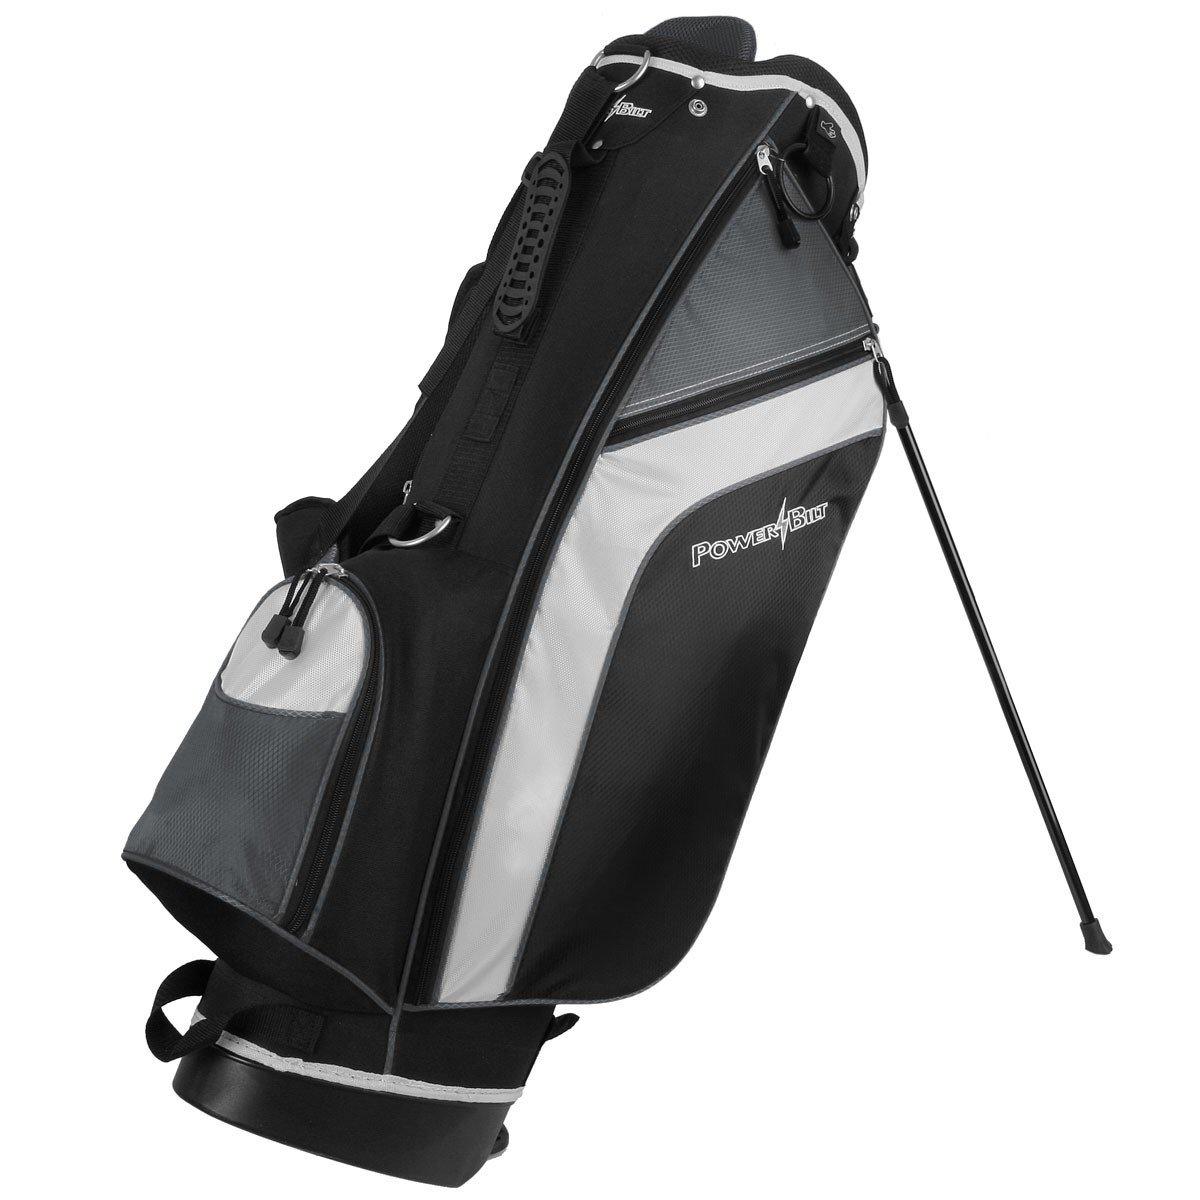 Powerbilt Santa Rosa Black/Charcoal Stand Golf Bag (Black/Charcoal)